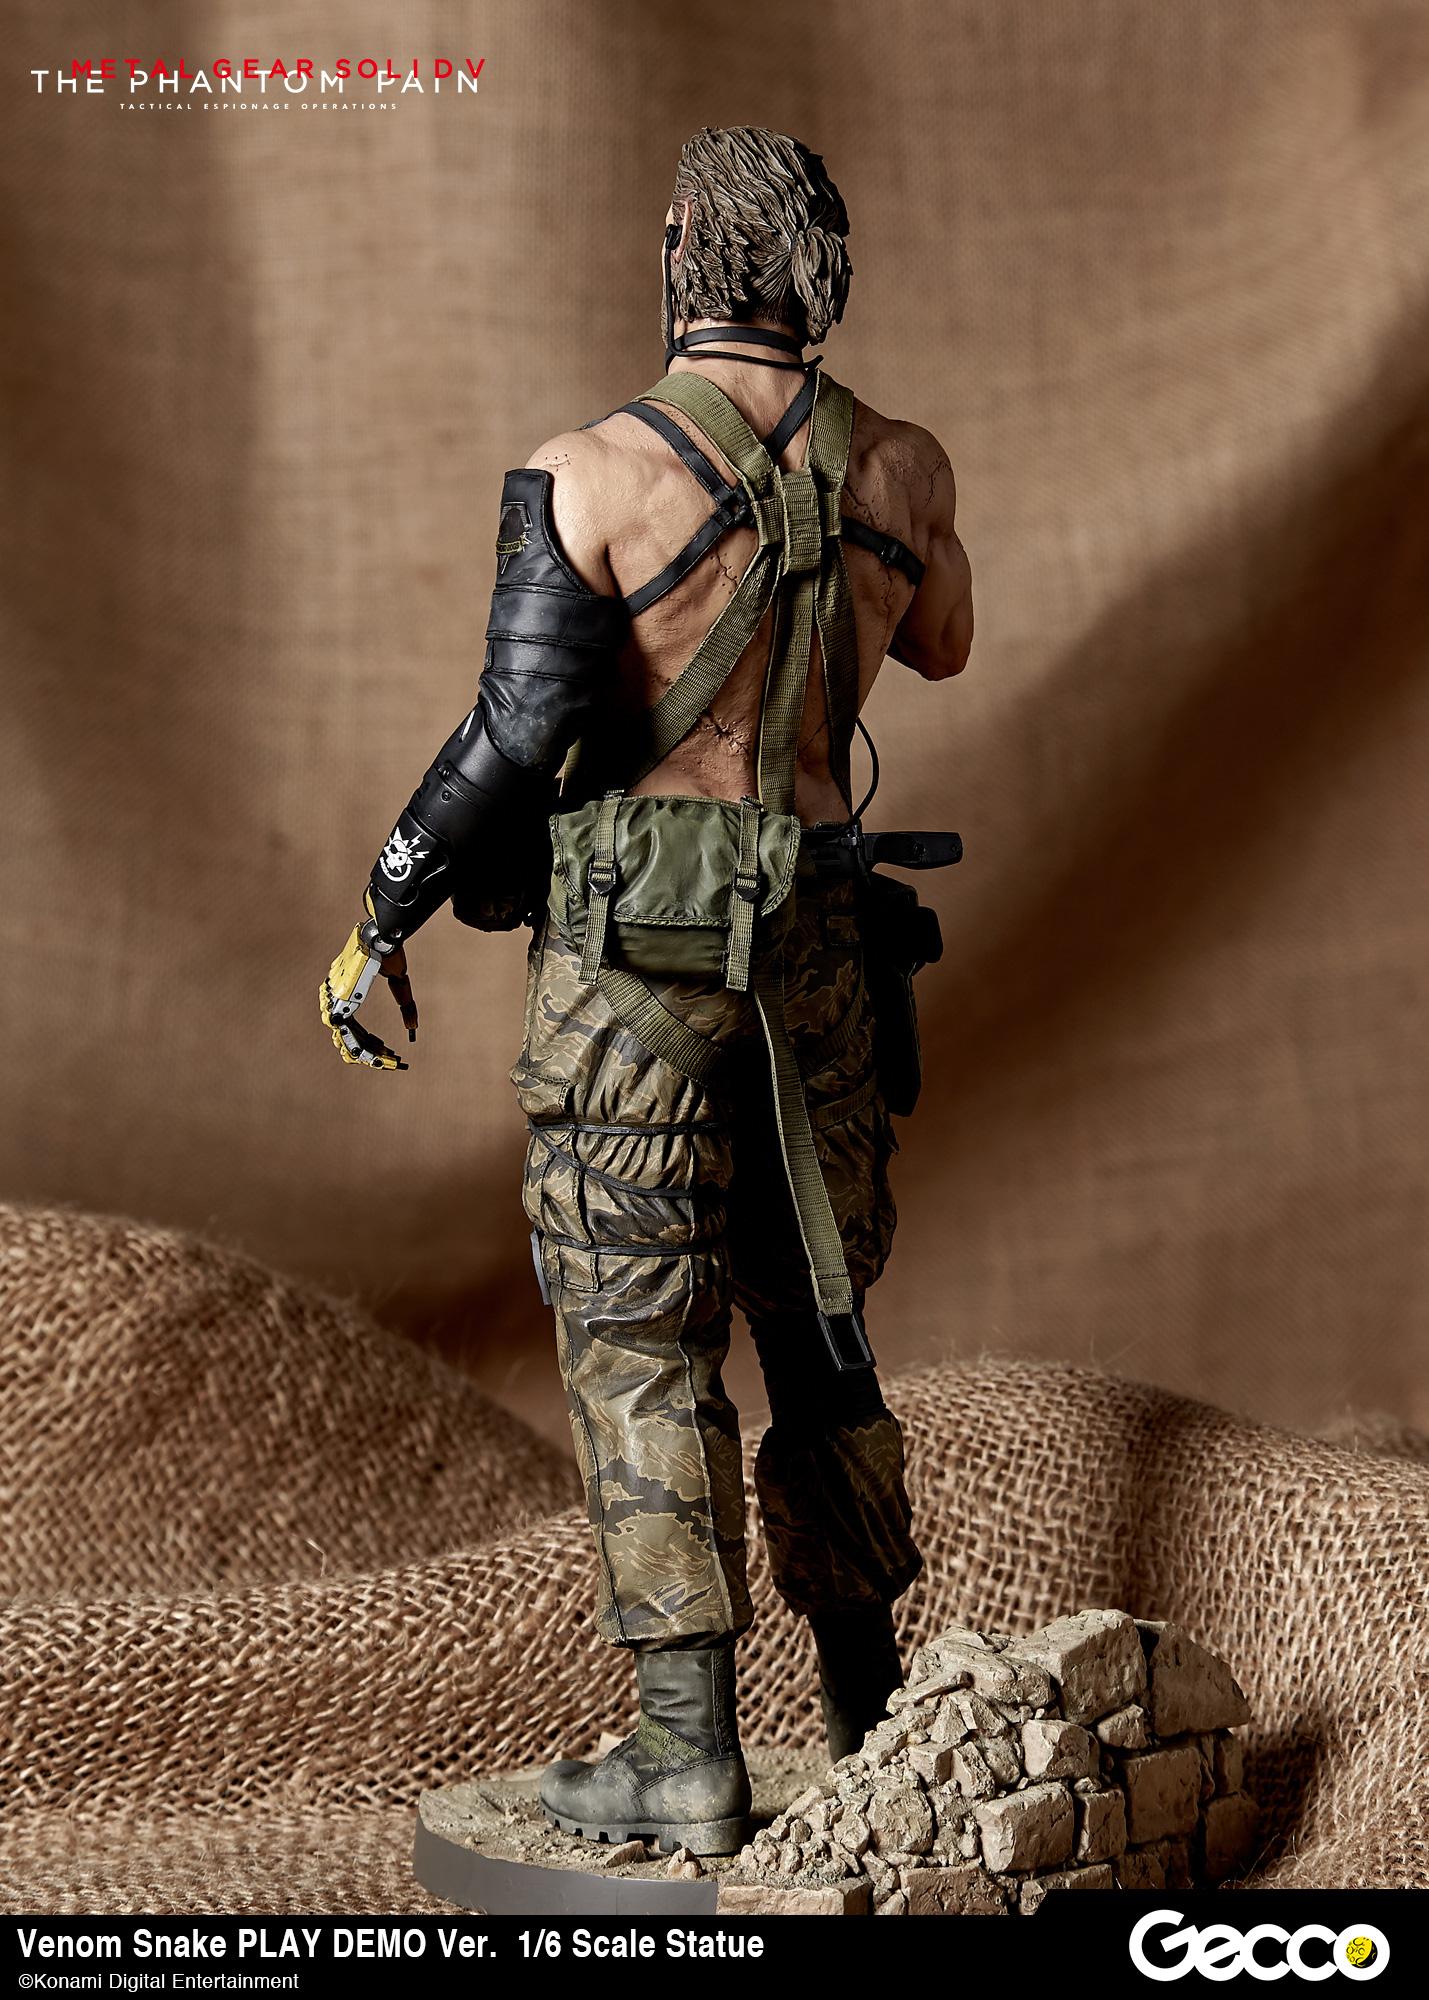 Metal Gear Solid V Venom Snake Play Demo Version Gecco